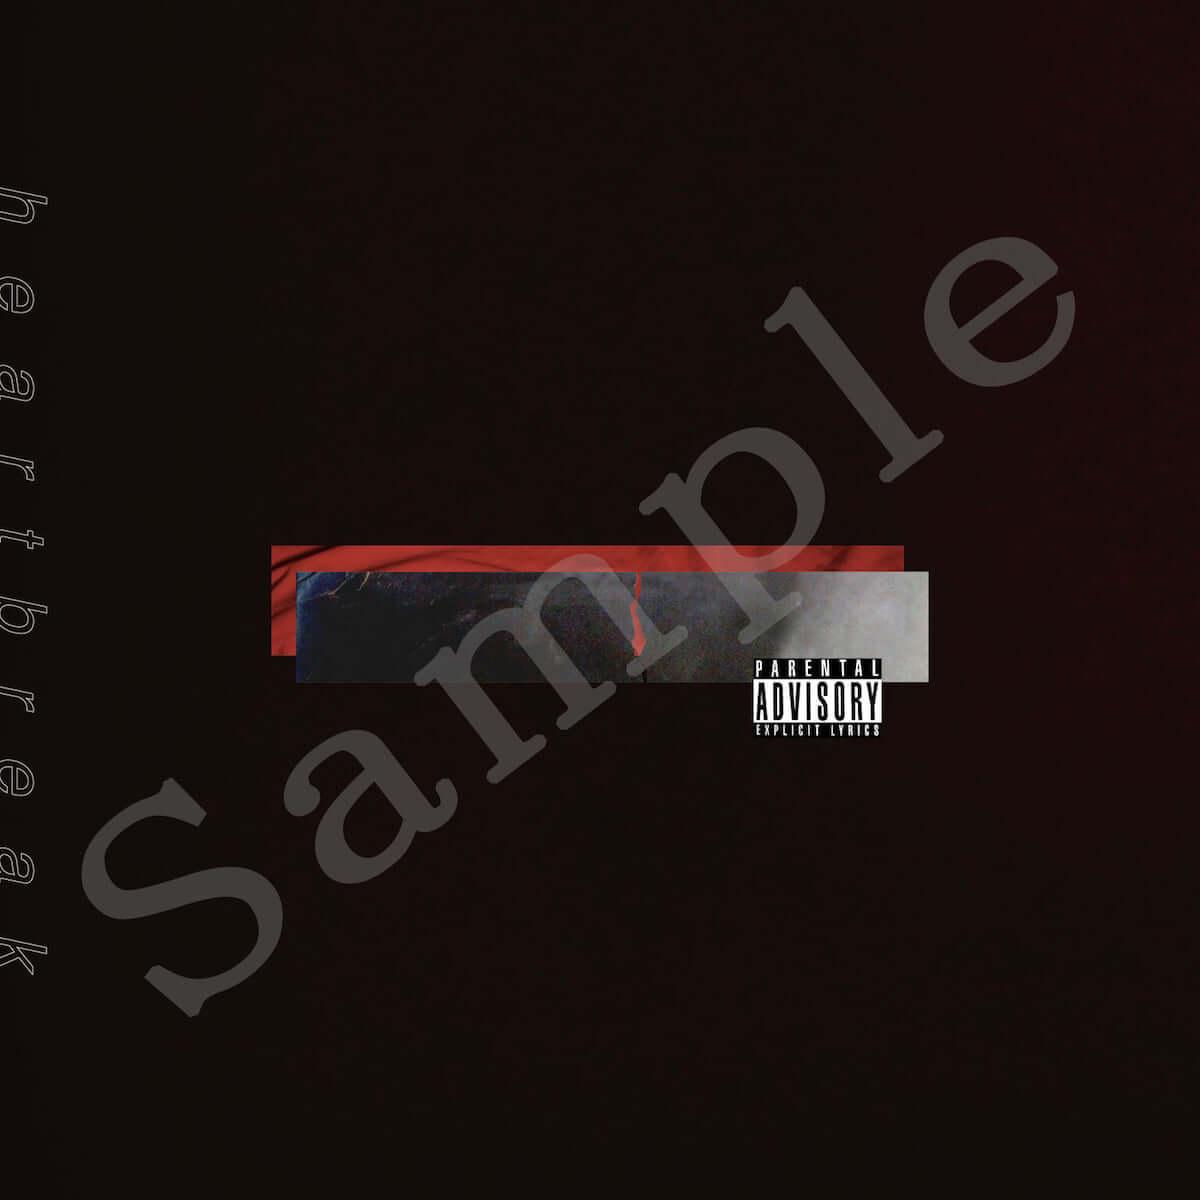 KEIJU、『heartbreak e.p.』に新曲を加えた完全生産限定盤を5月22日リリース|BAD HOPのYZERRらが新たに参加 music190422_keiju_1-1200x1200